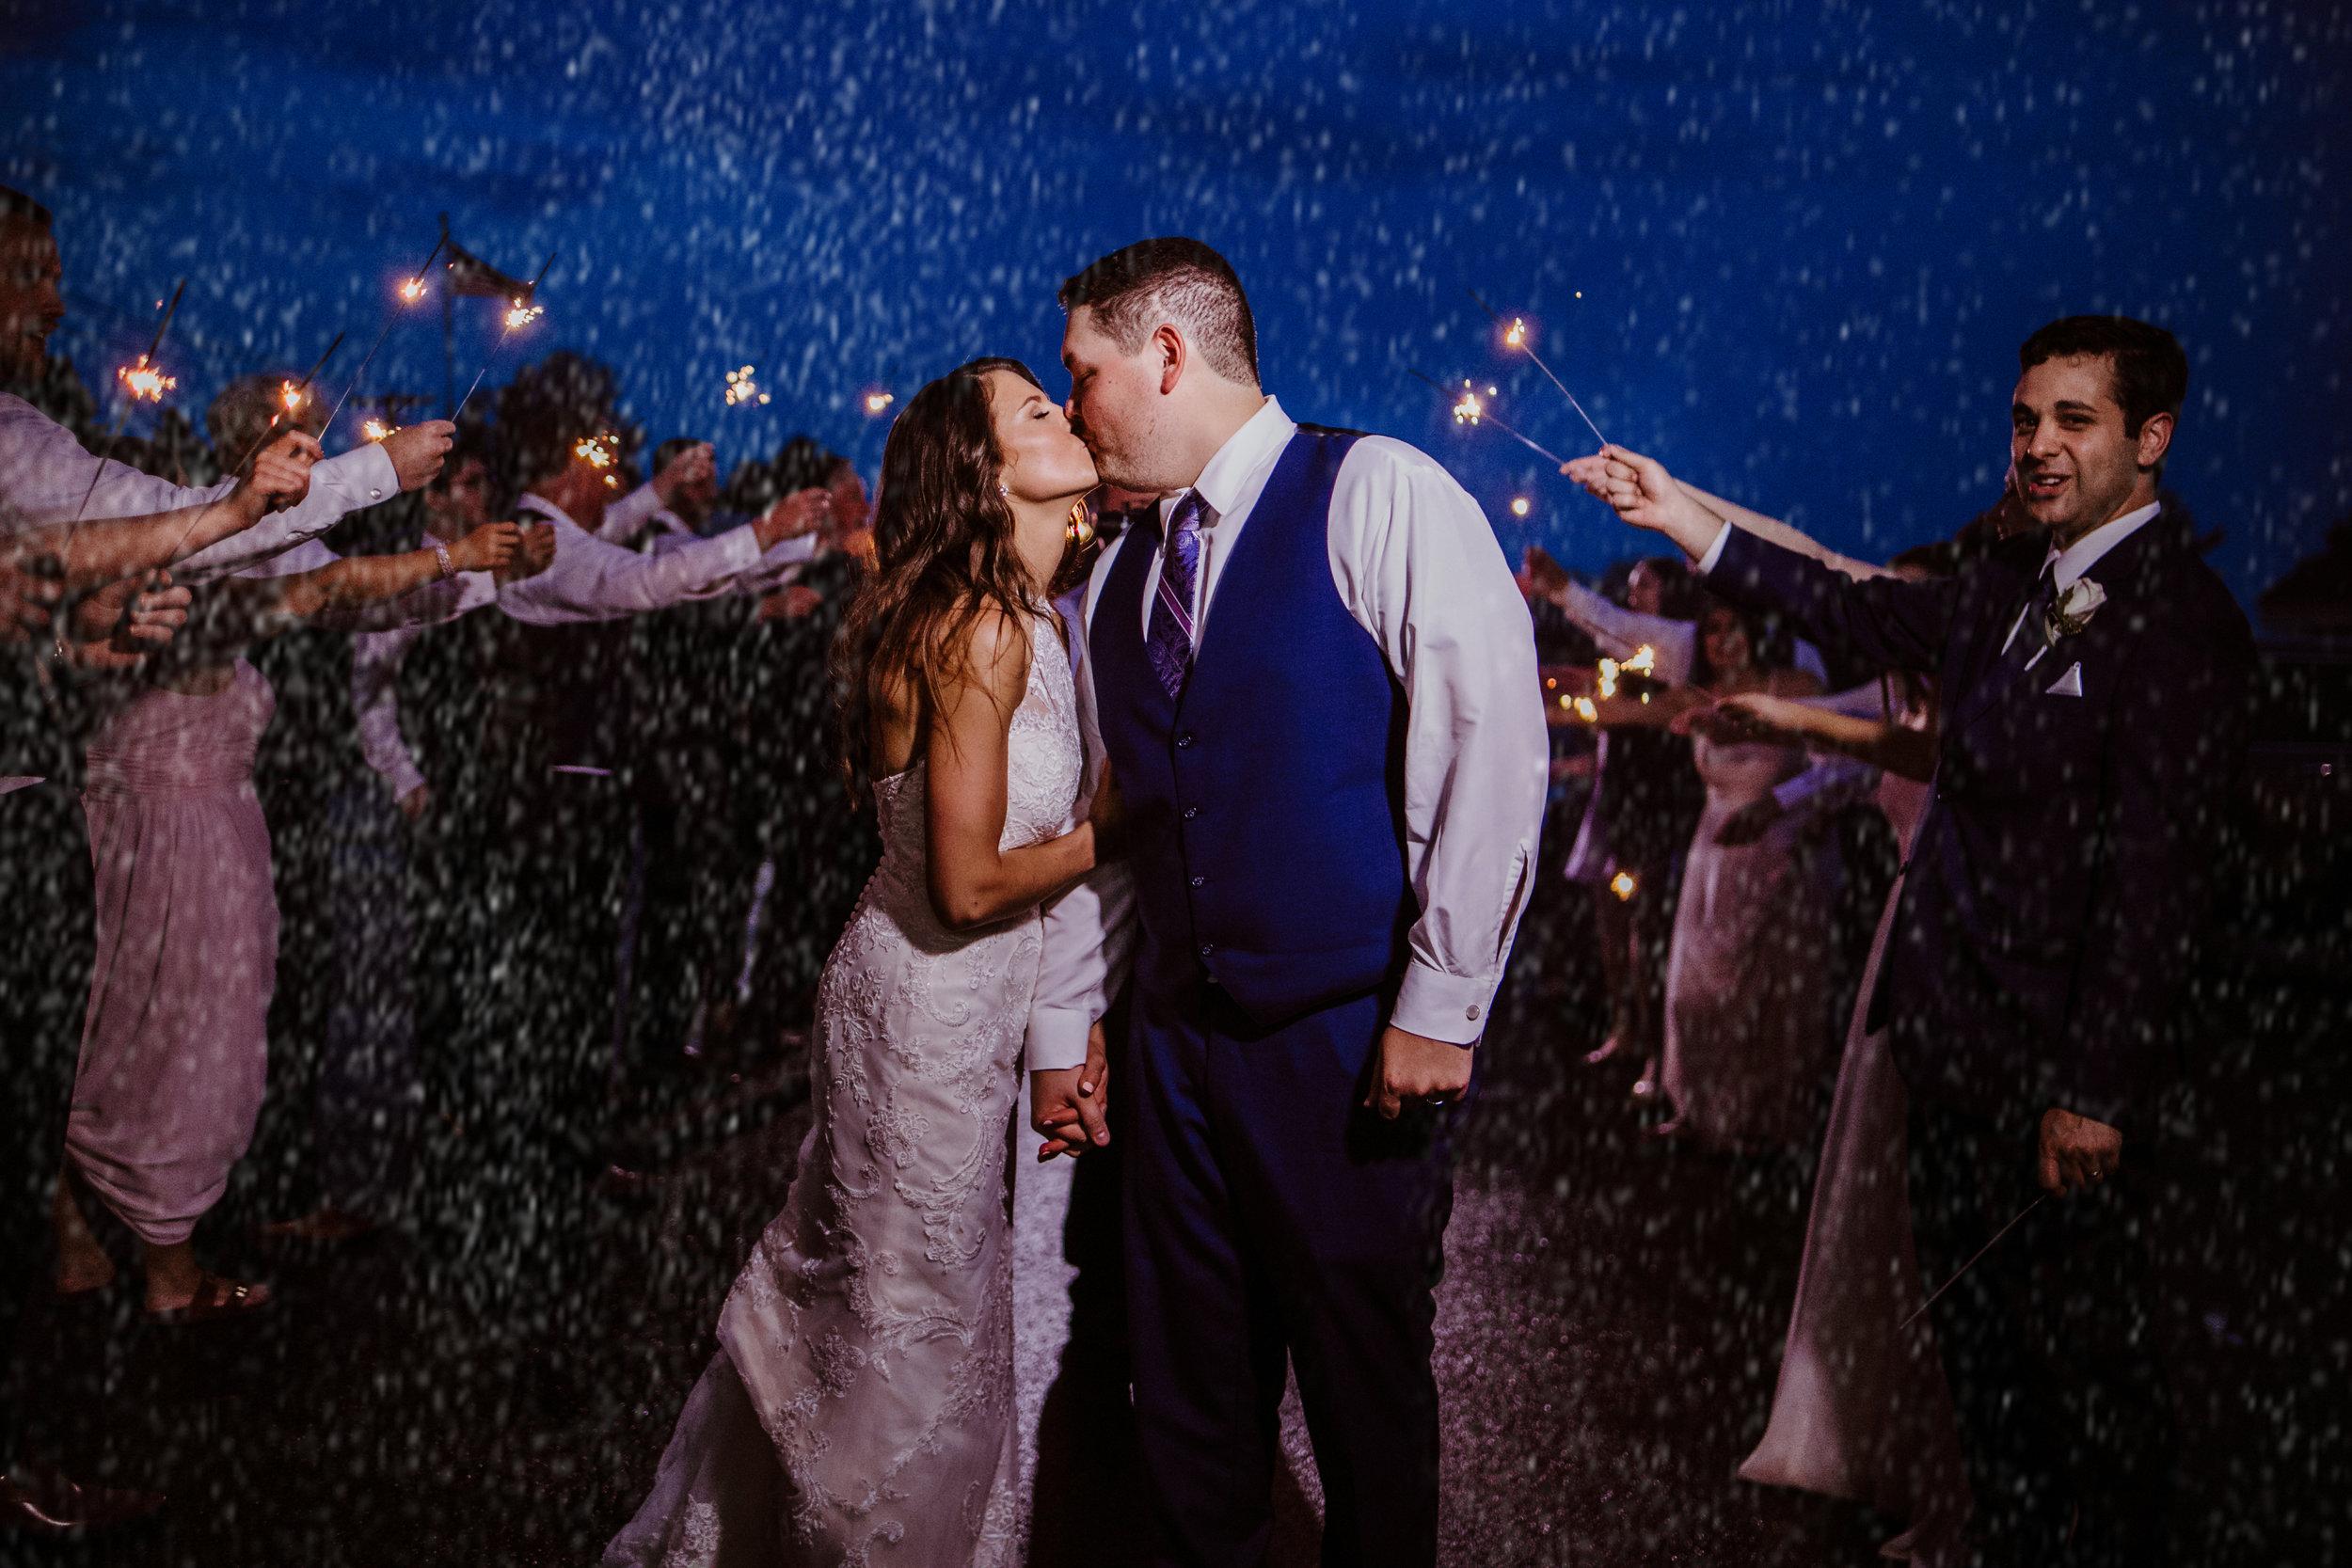 Sparklers-in-the-rain-davenport-iowa.jpg